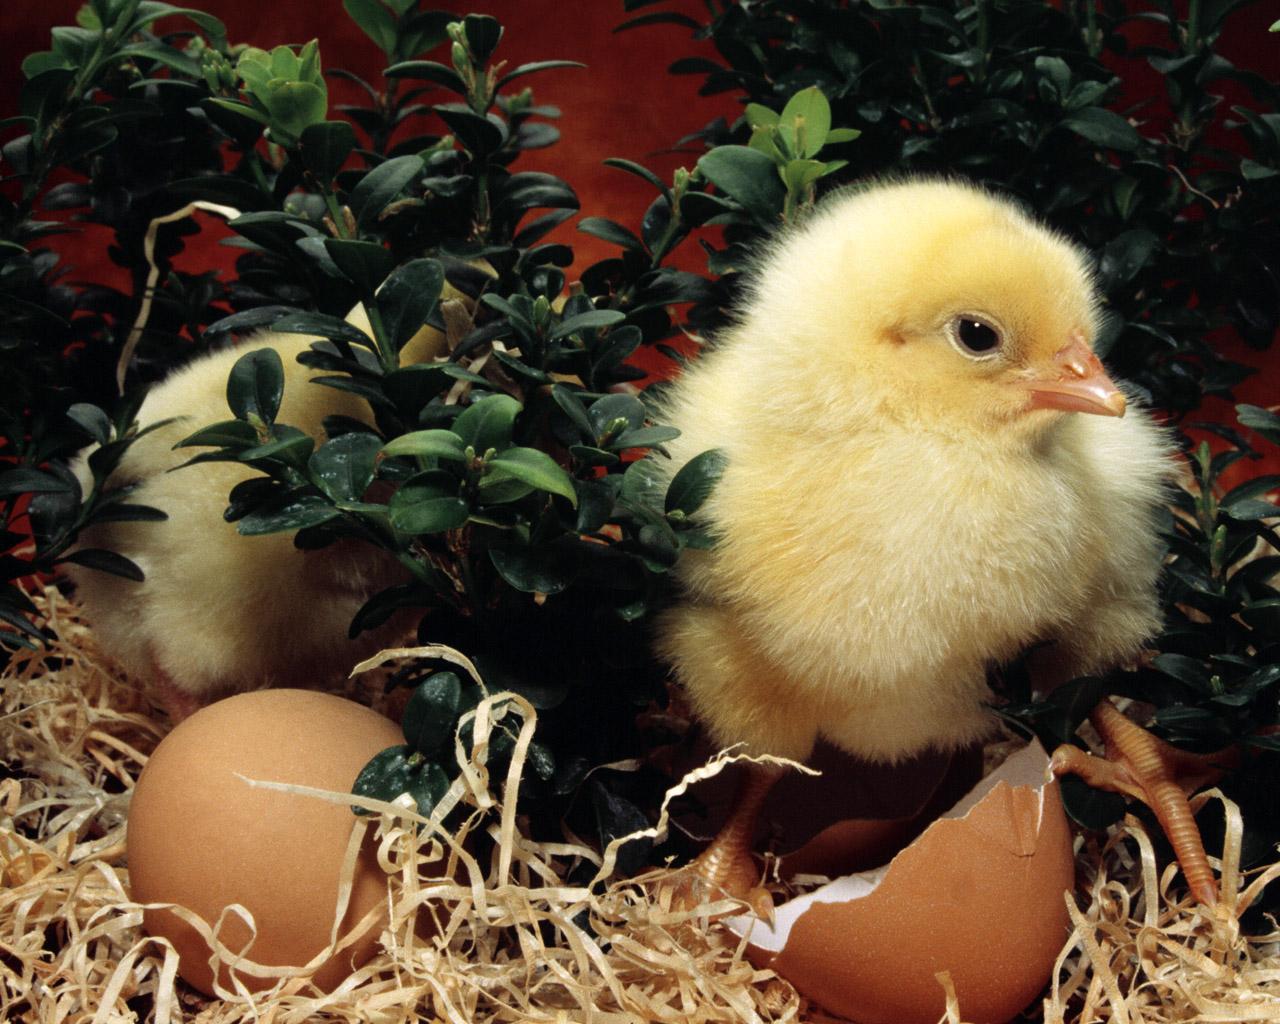 http://3.bp.blogspot.com/-nDJbH_i10EE/T2yIQuUfowI/AAAAAAAAAy8/O41OhMehNQY/s1600/Chicken_Wallpaper_06.jpg